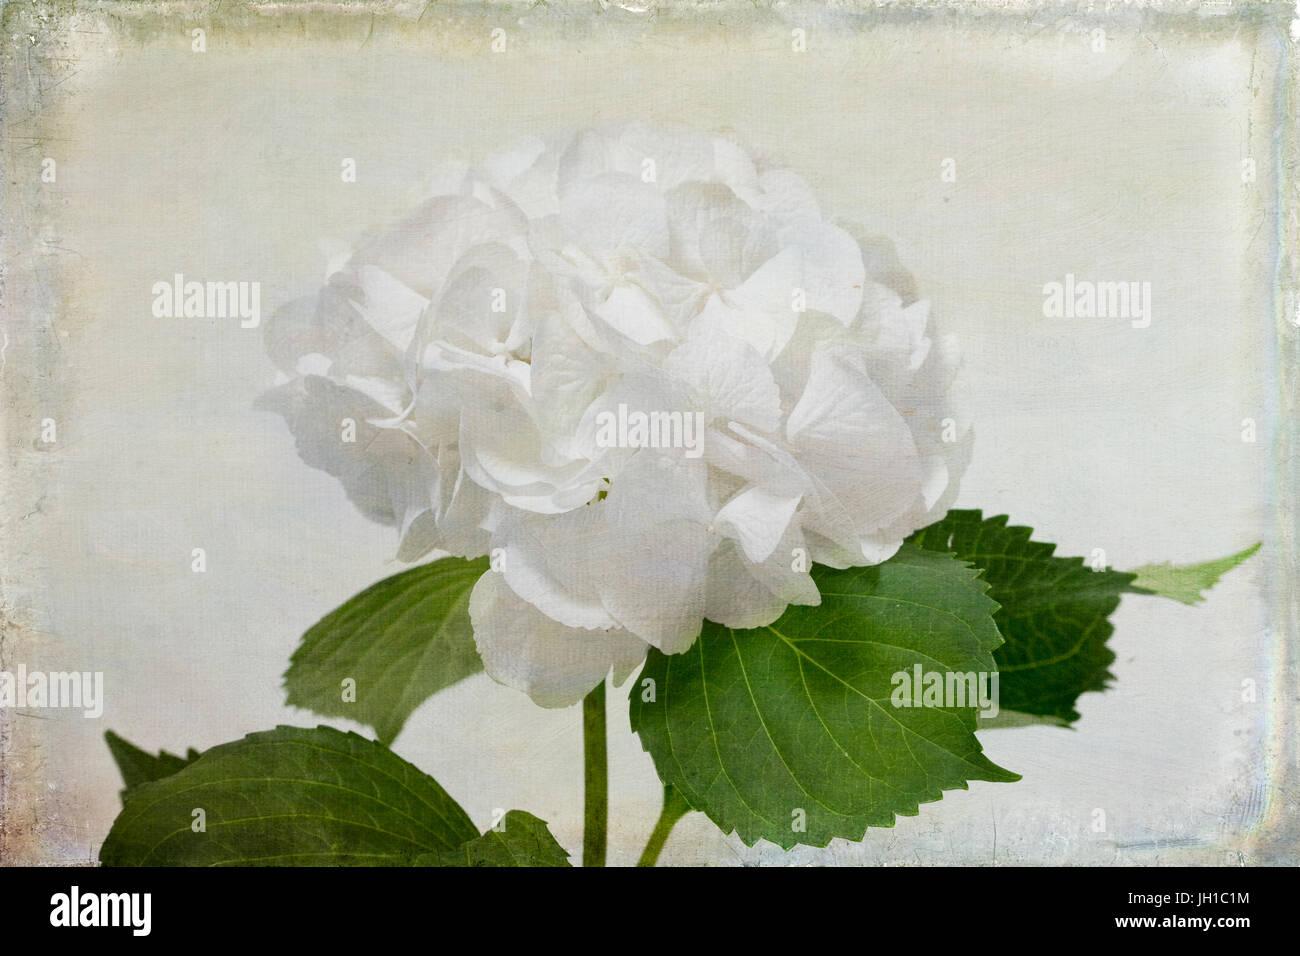 Close up study of a white mop head Hydrangea. - Stock Image